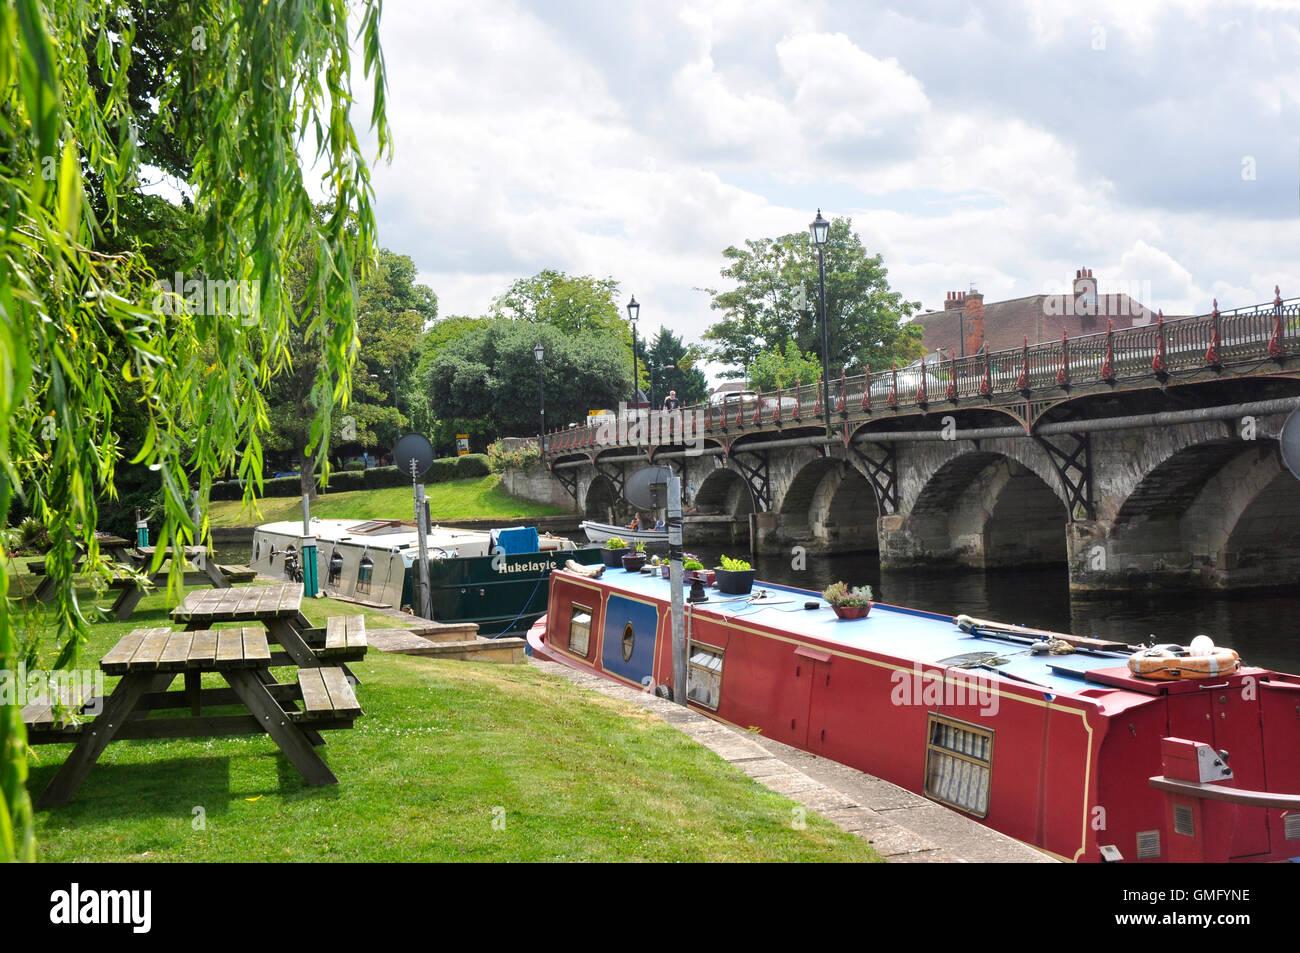 Warwickshire Stratford upon Avon - the marina - moored narrow boats - picnic tables - willow trees - backdrop town - Stock Image